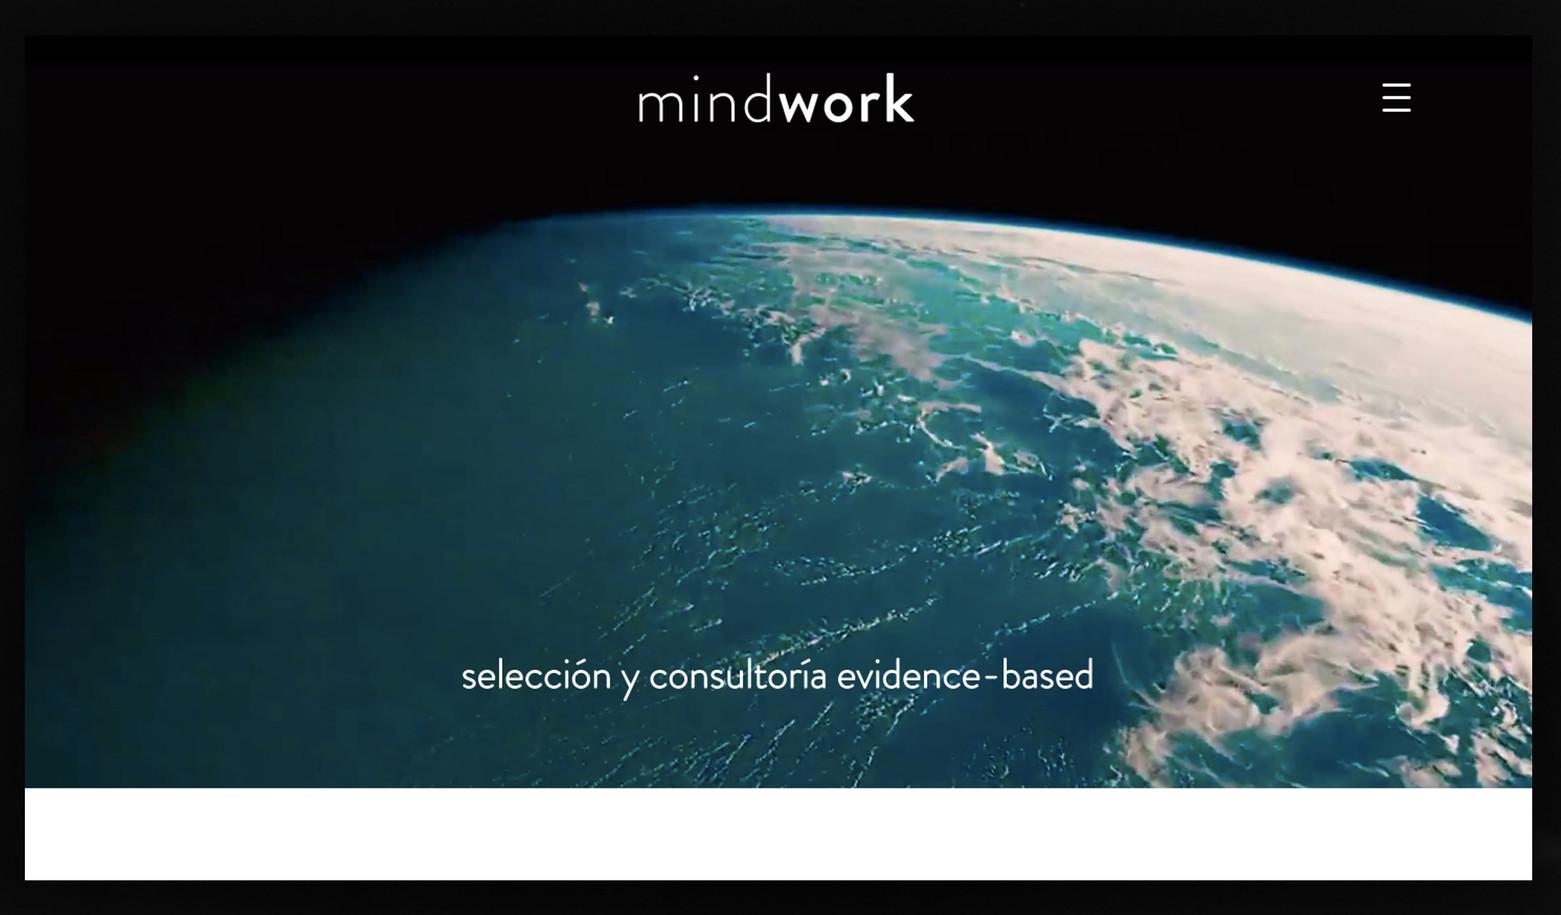 Mindwork 1.jpg